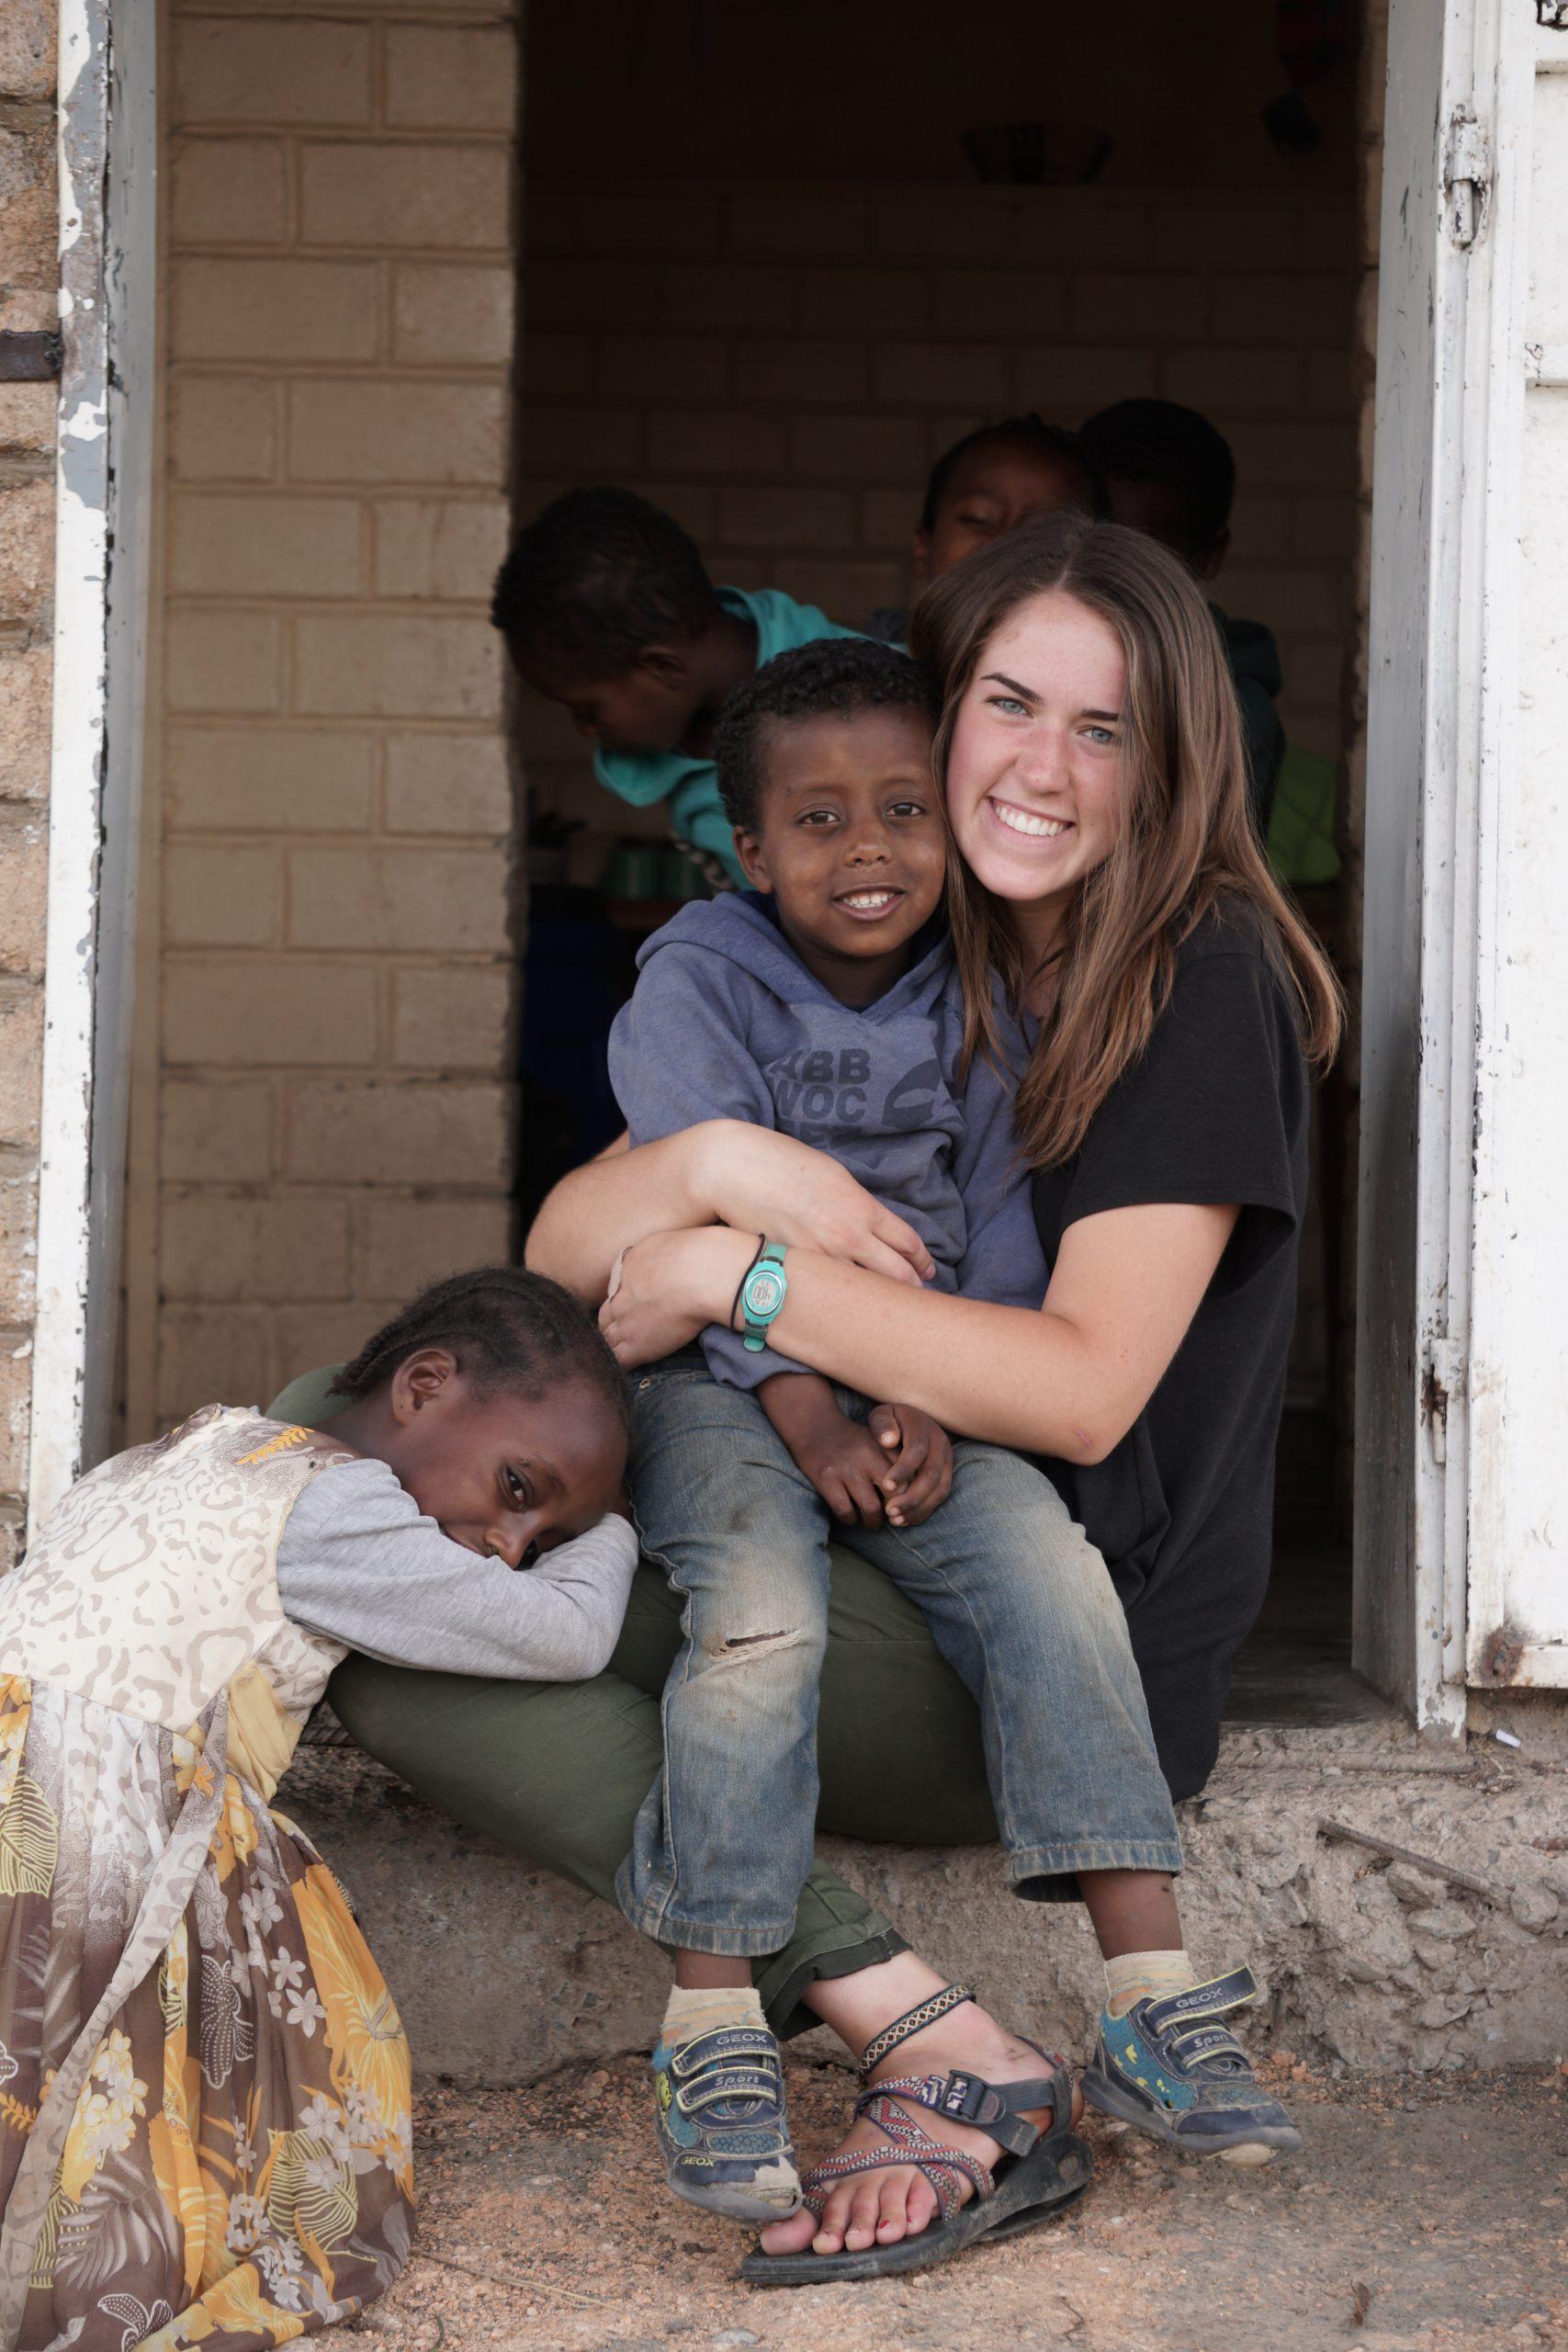 Abby Heskett World Race Gap Year Ethiopia